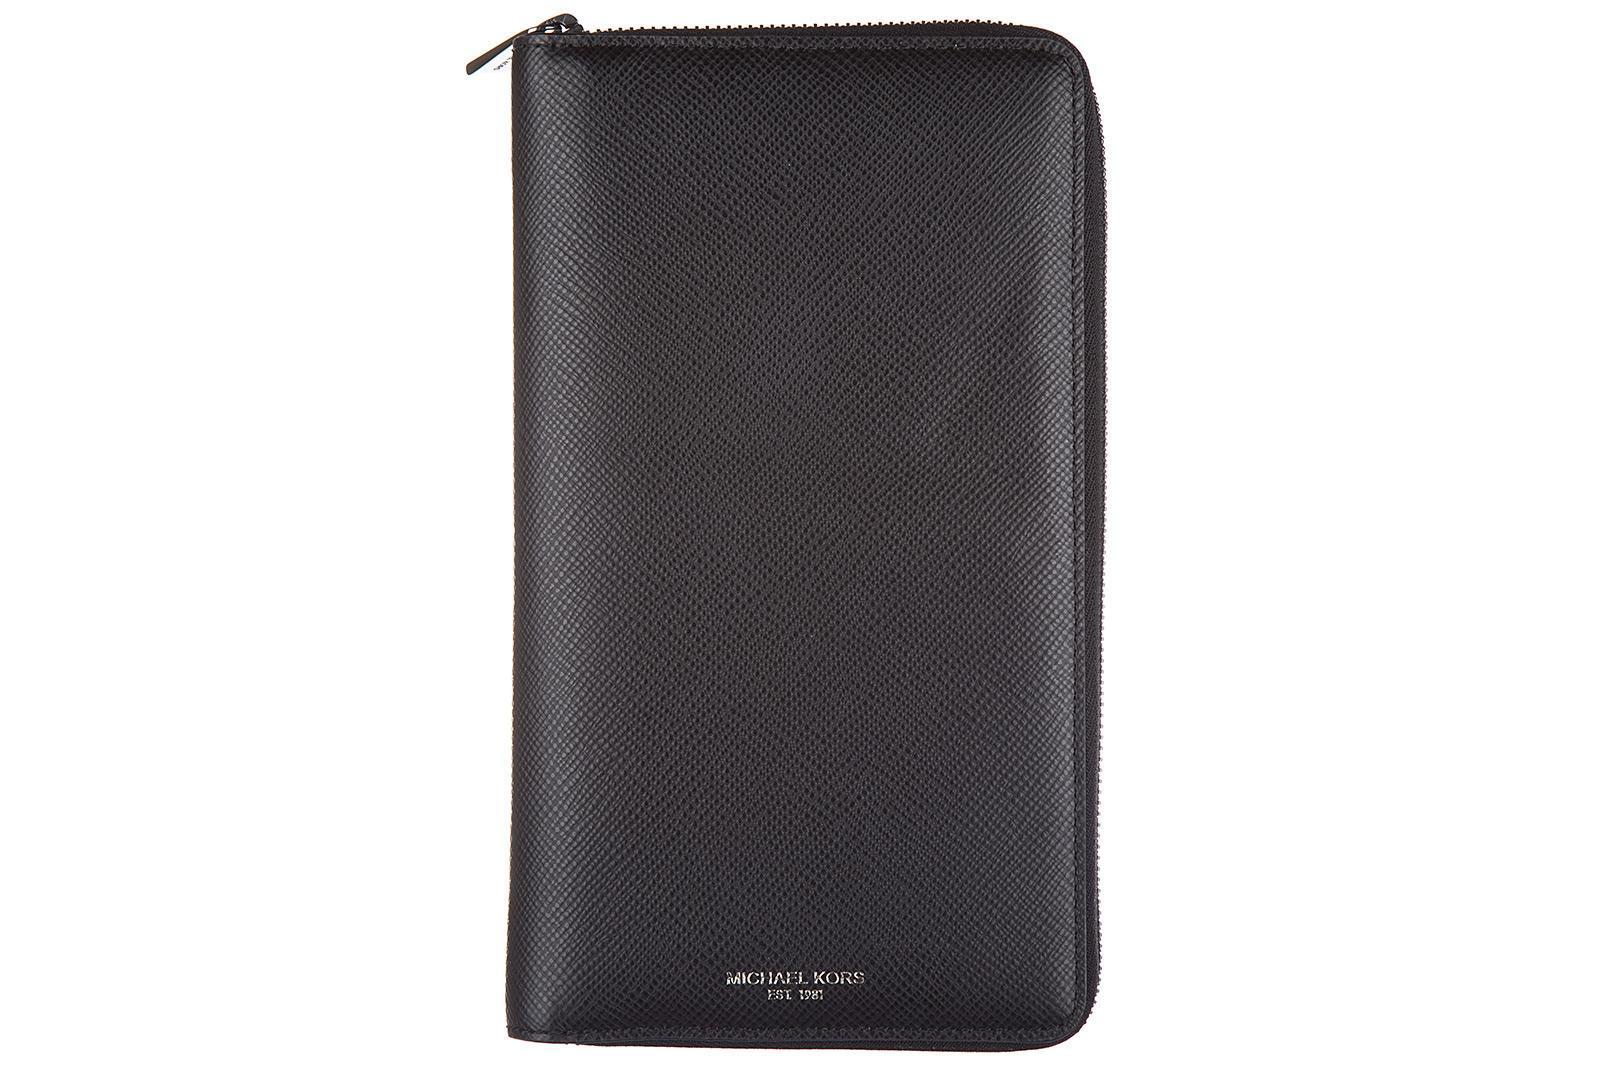 Michael Kors Men's Wallet Genuine Leather Coin Case Holder Purse Card Bifold Harrison Travel In Black